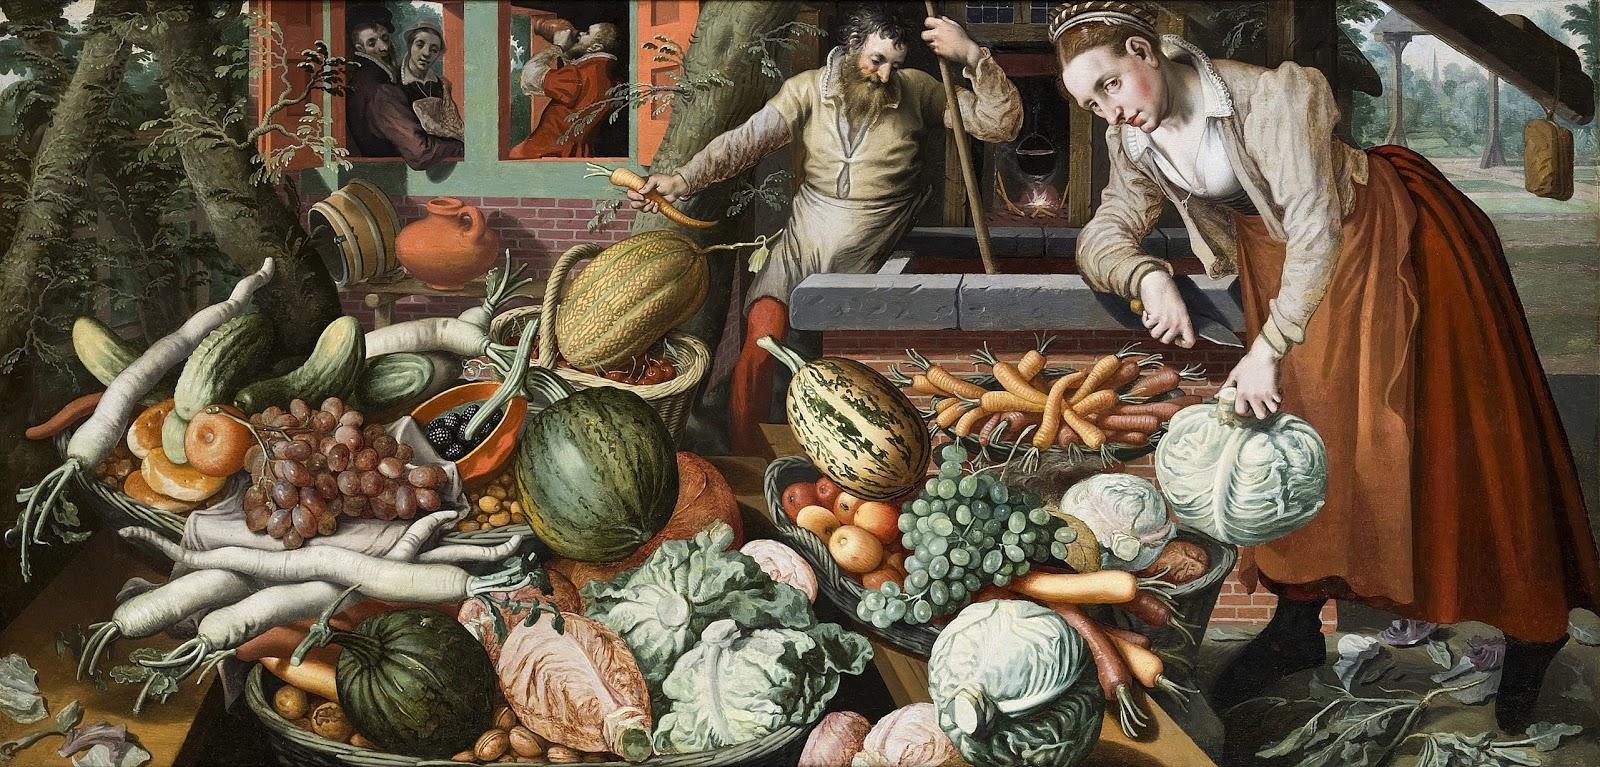 Remarkable, 16th art century erotic